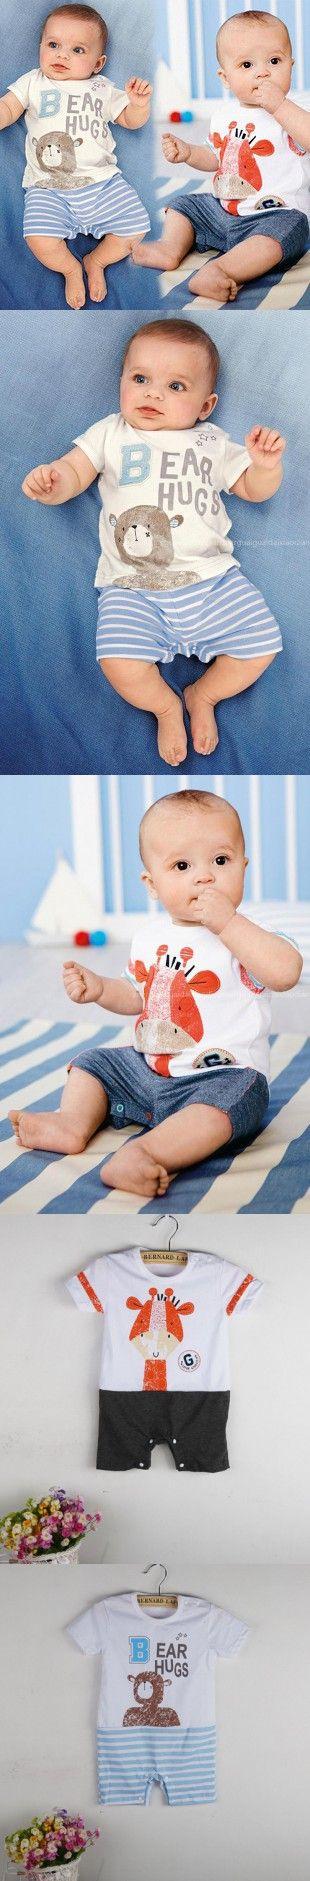 2016 Summer Newborn Baby Boy Clothes Giraffe Print Infant Baby Romper Newborn Clothes Original Bear Baby Jumpsuit